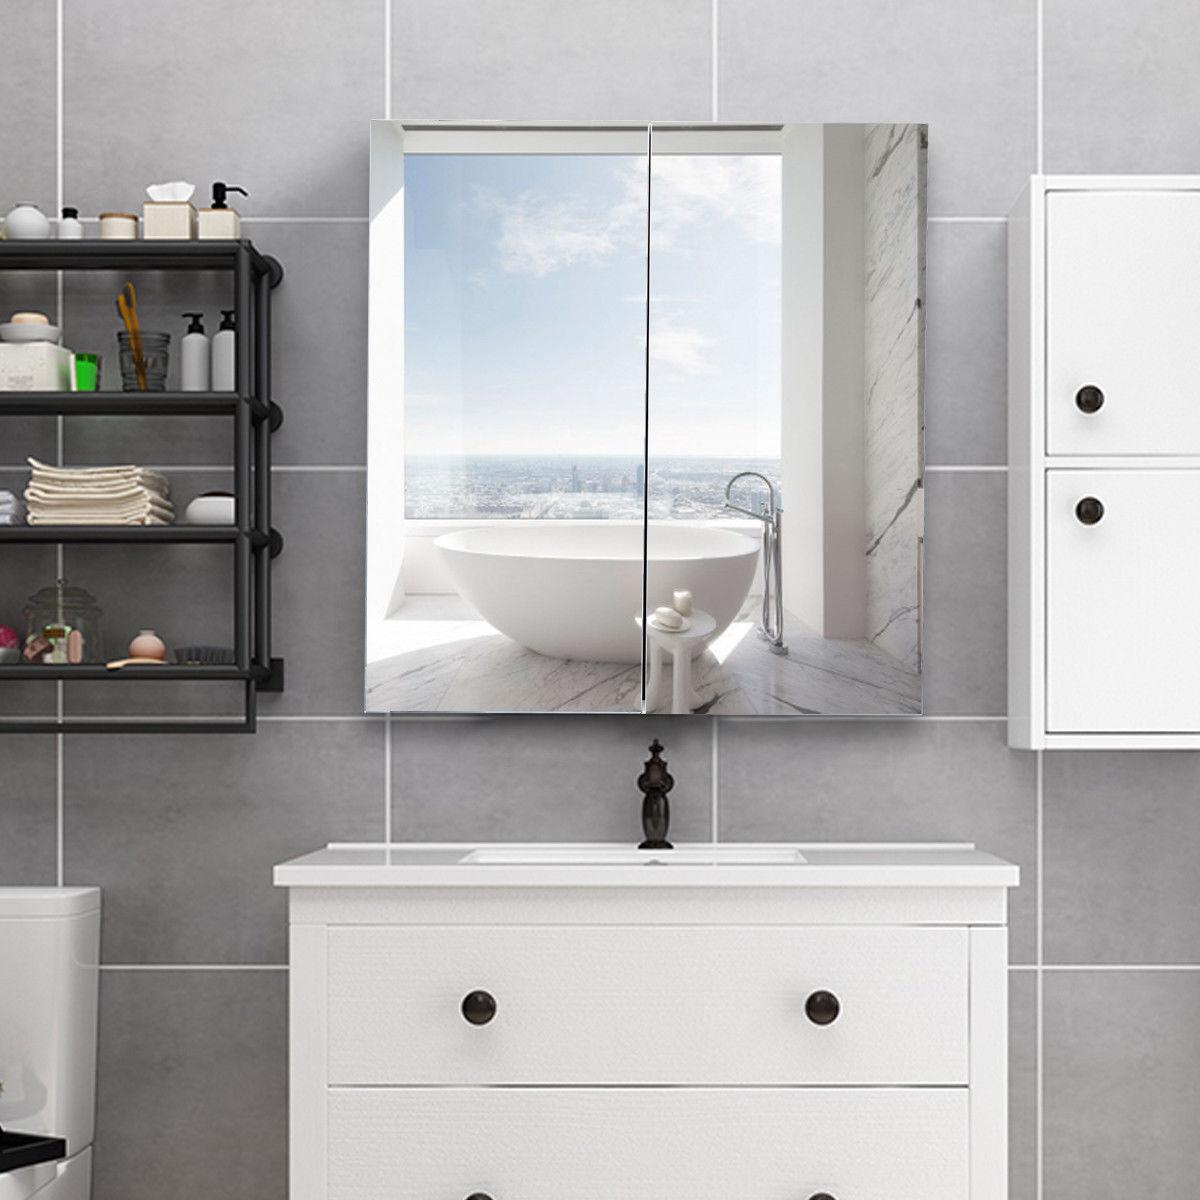 Gymax 24 Wide Wall Mount Mirrored Bathroom Cine Storage Cabinet 2 Mirror Door New